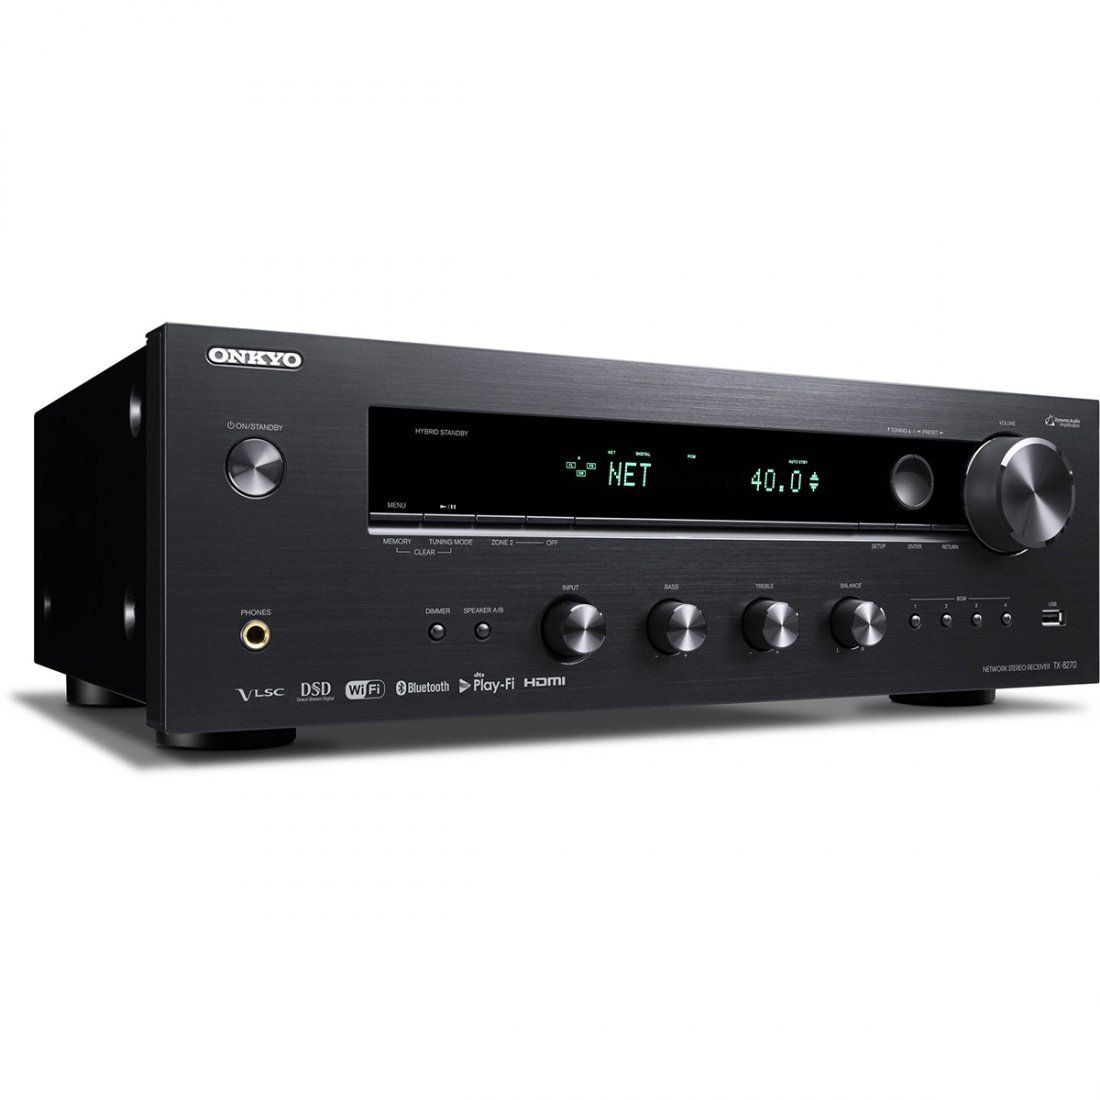 Onkyo TX-8270 Receiver Estéreo HDMI Spotify Bluetooth Wireless USB